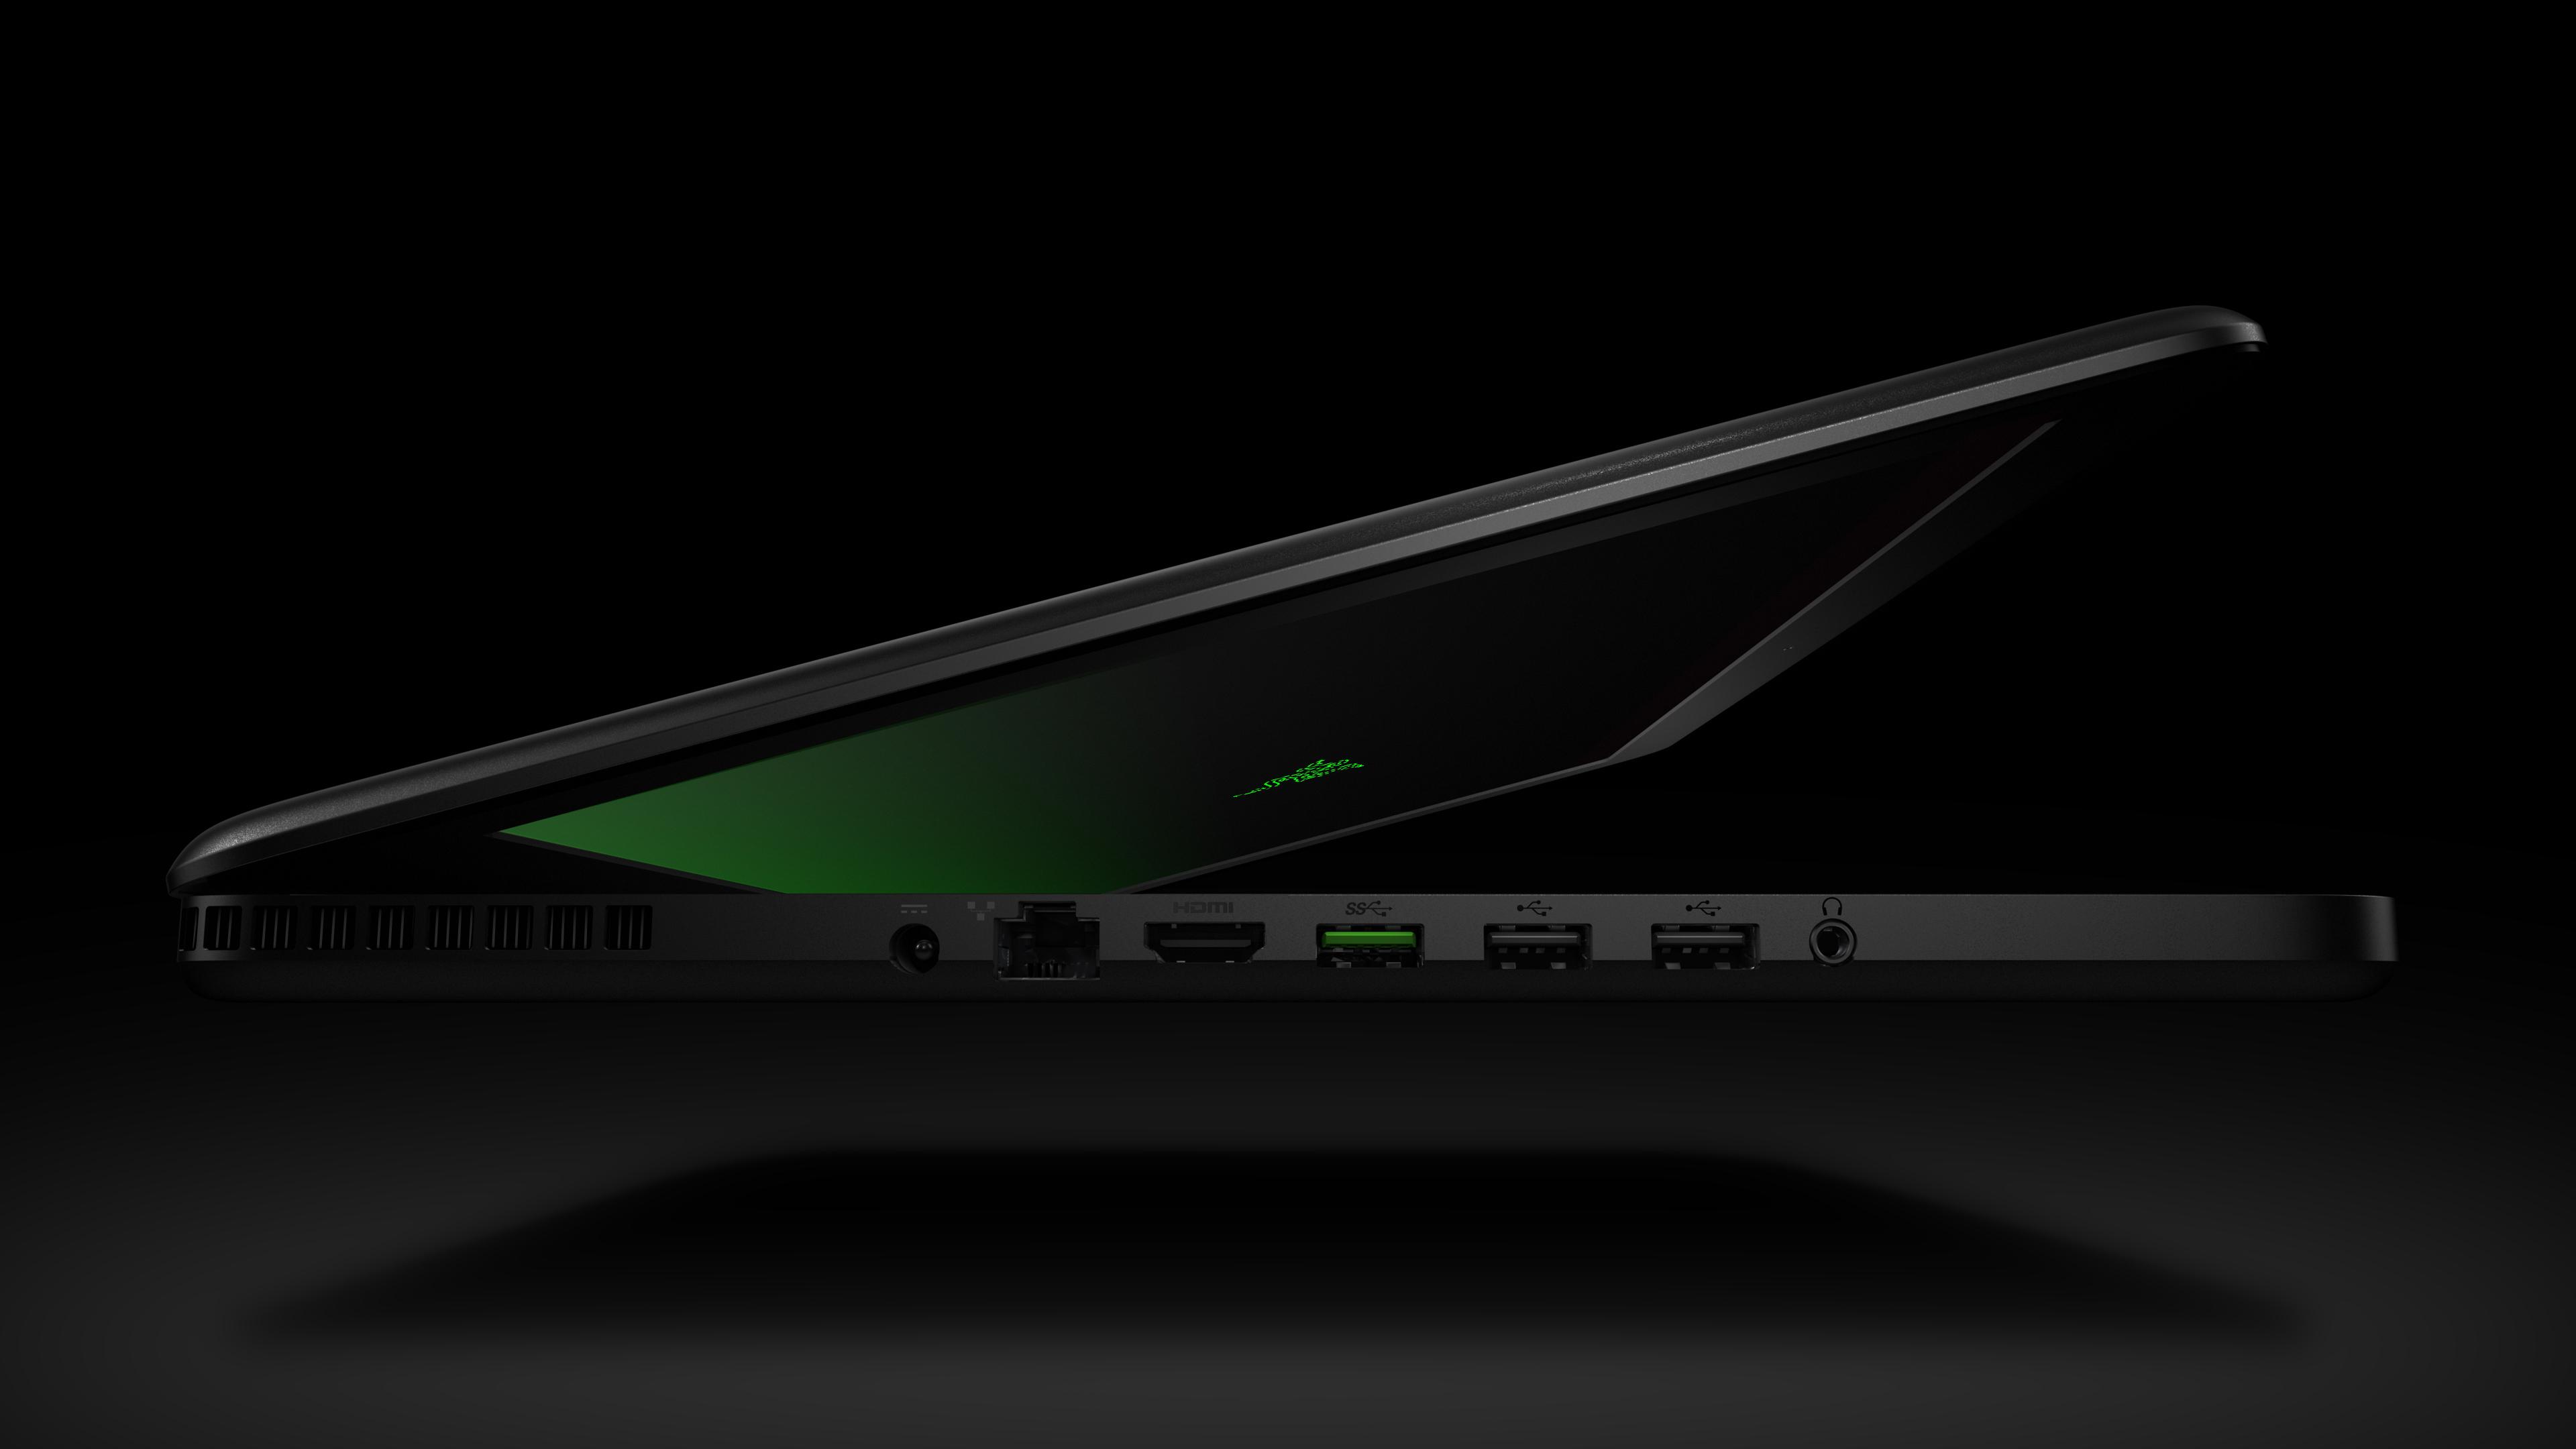 desiibond 39 s newsroll razer blade gaming laptop released. Black Bedroom Furniture Sets. Home Design Ideas